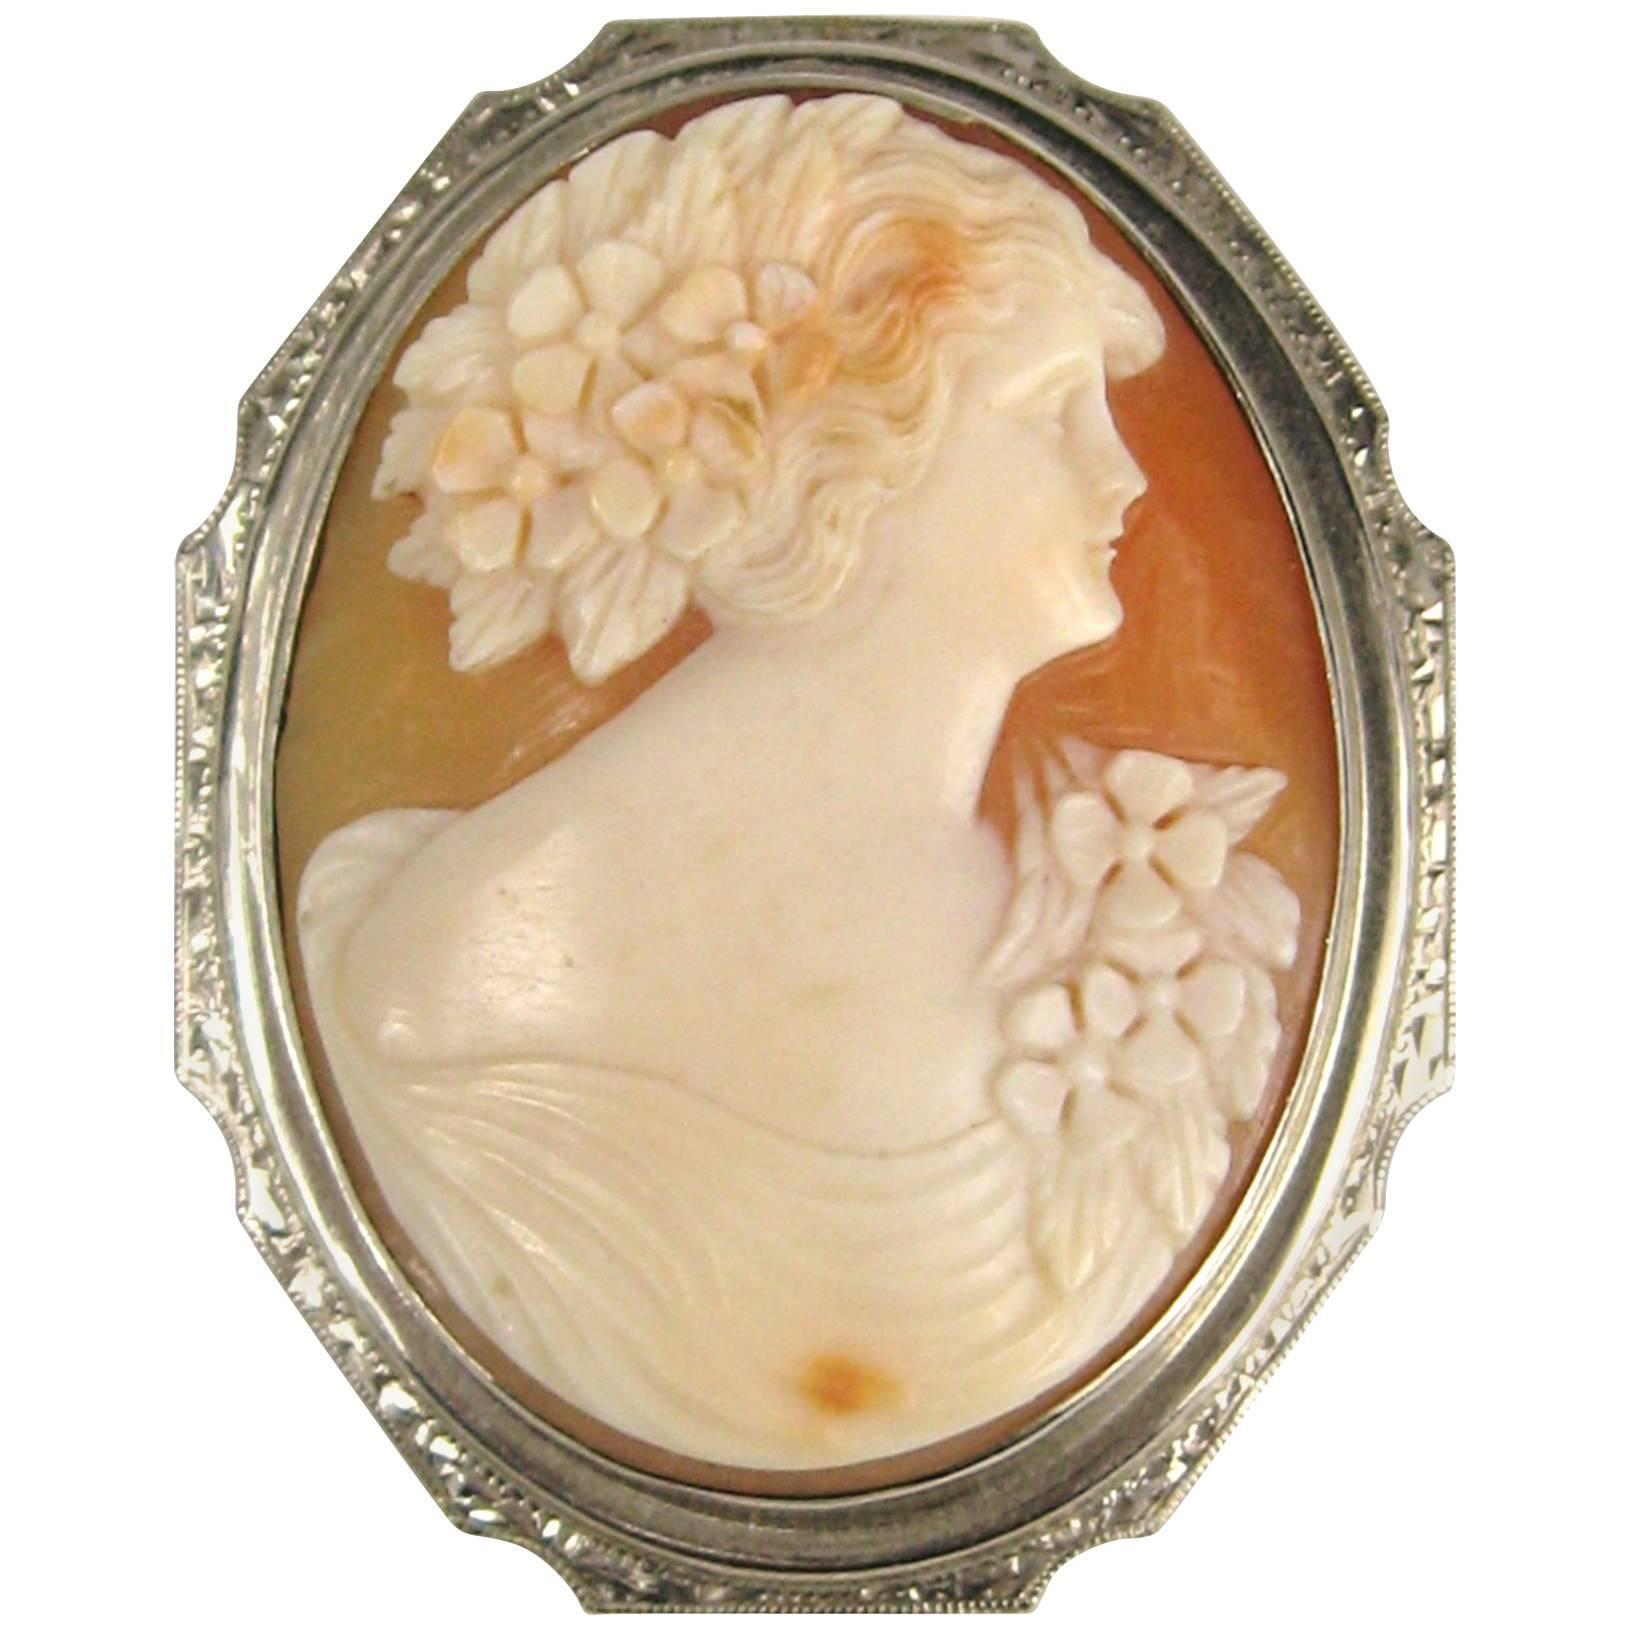 Antique Cameo White 14 Karat Gold Brooch Pendant